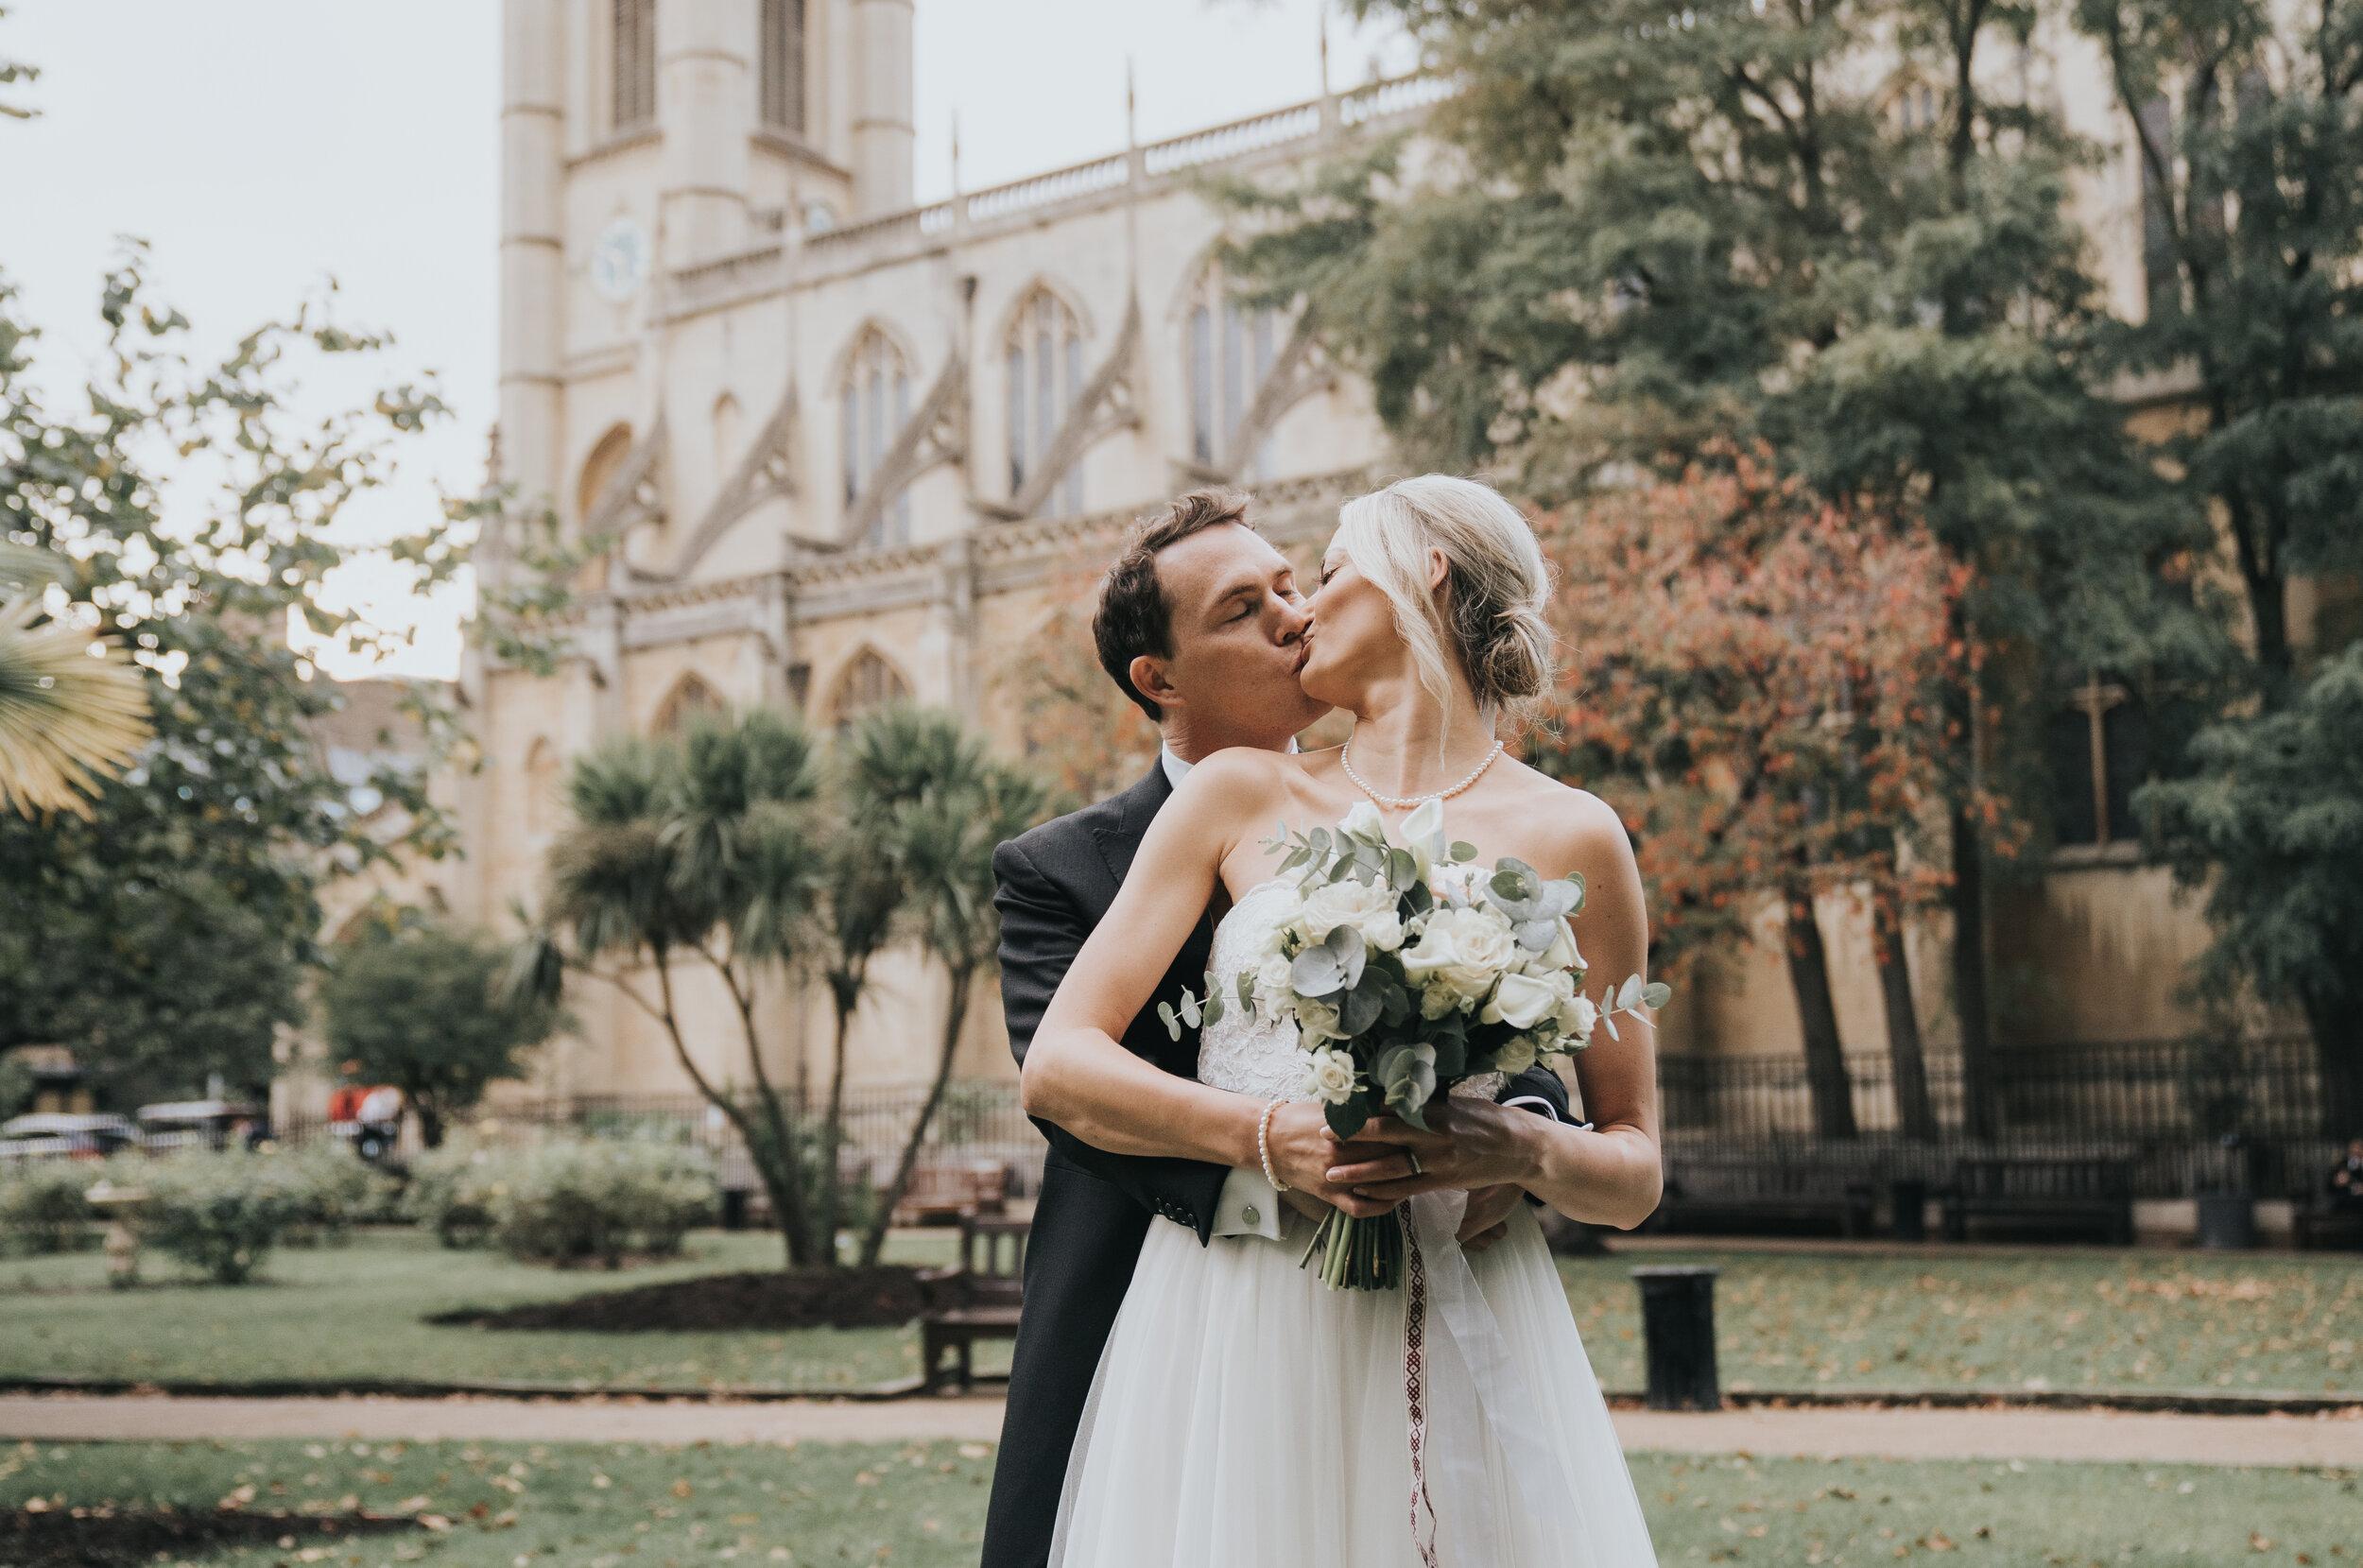 chelsea-london-wedding-photographer-videographer-chelsea-town-hall-35